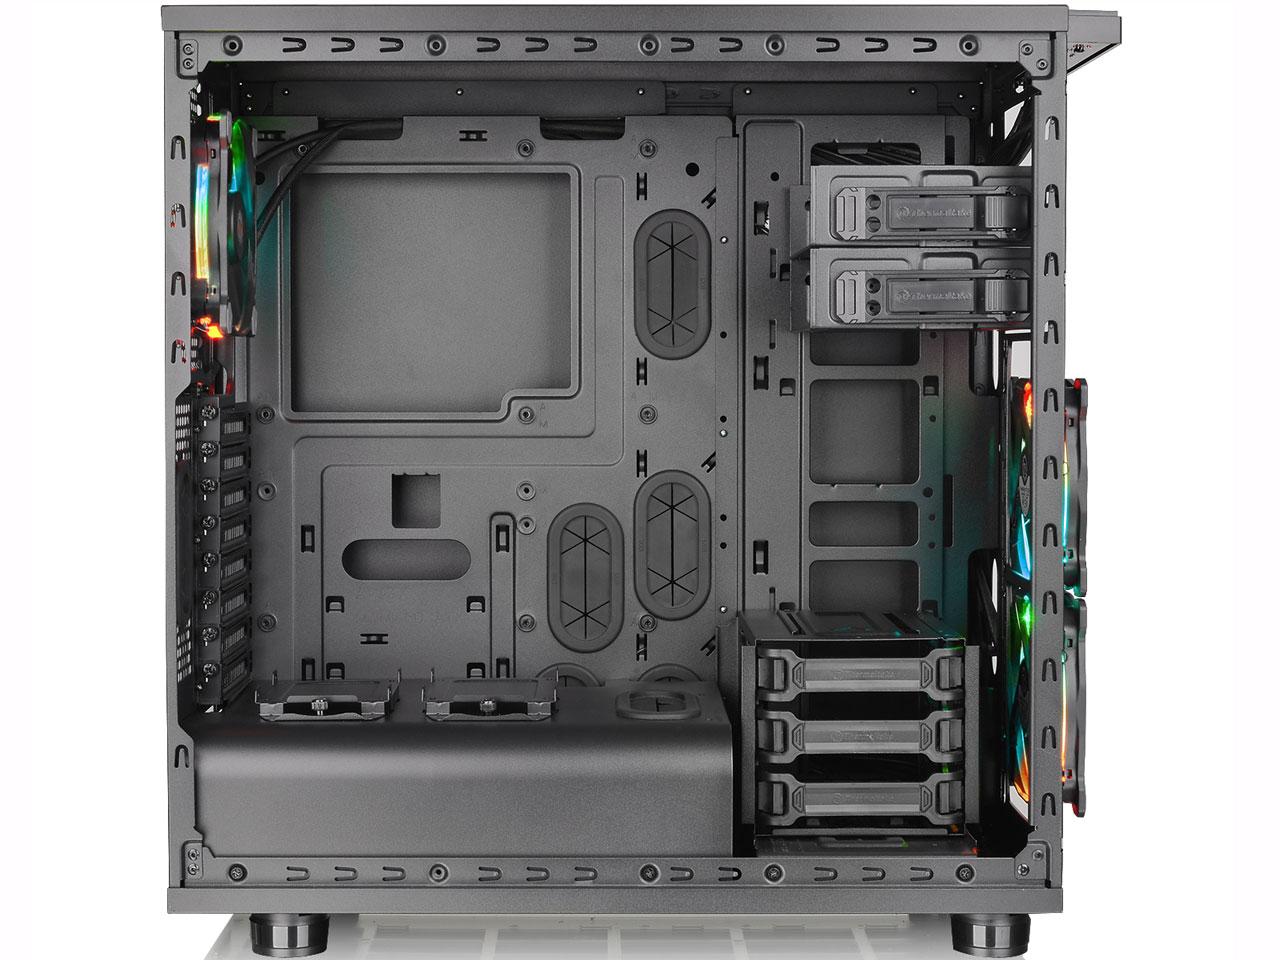 『本体 内部1』 Core X31 RGB CA-1E9-00M1WN-02 の製品画像